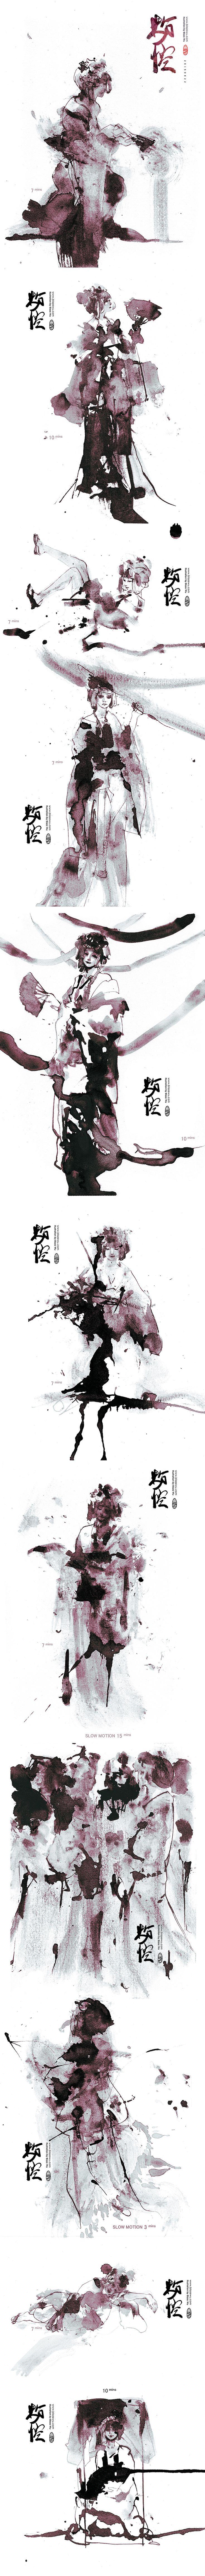 | 20150822 | Subject:粉悾 / Illustration by Blaze Wu.